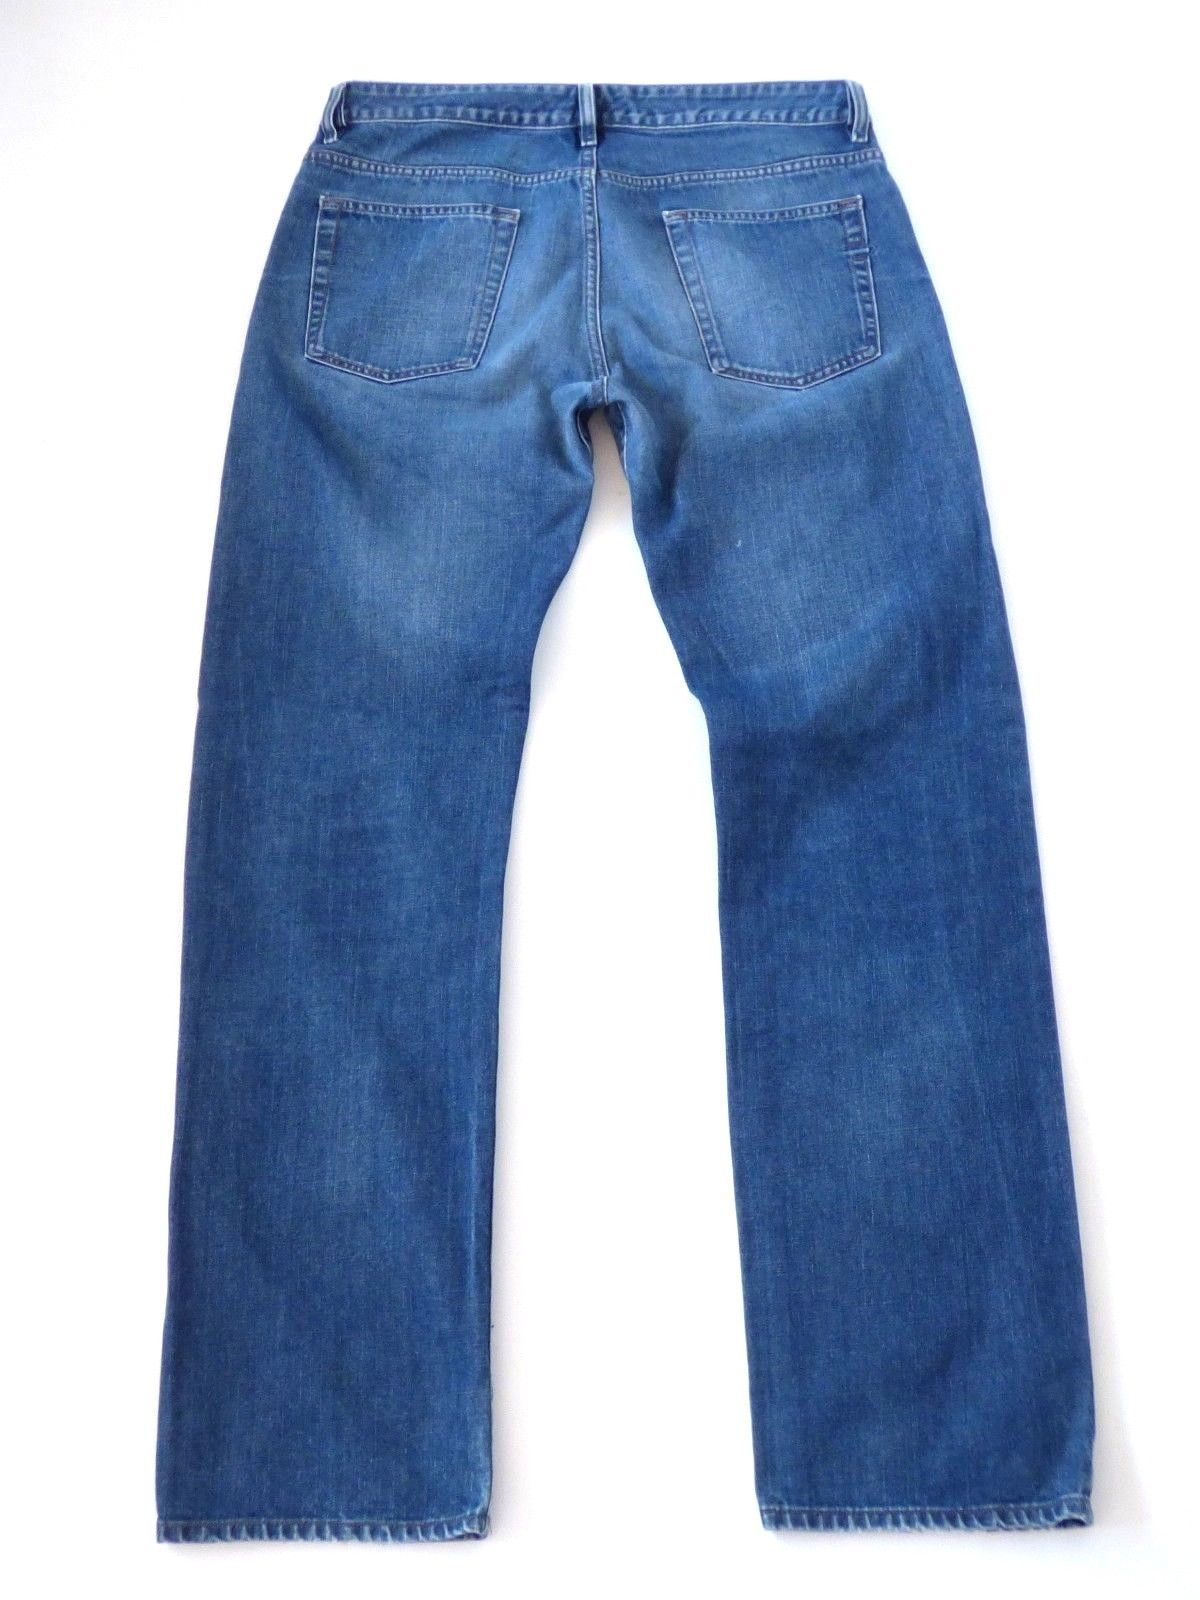 059e90b4 Men's Vintage Rare DIESEL RABOX 80P Button Fly Straight Blue Denim Jeans  W35 L34